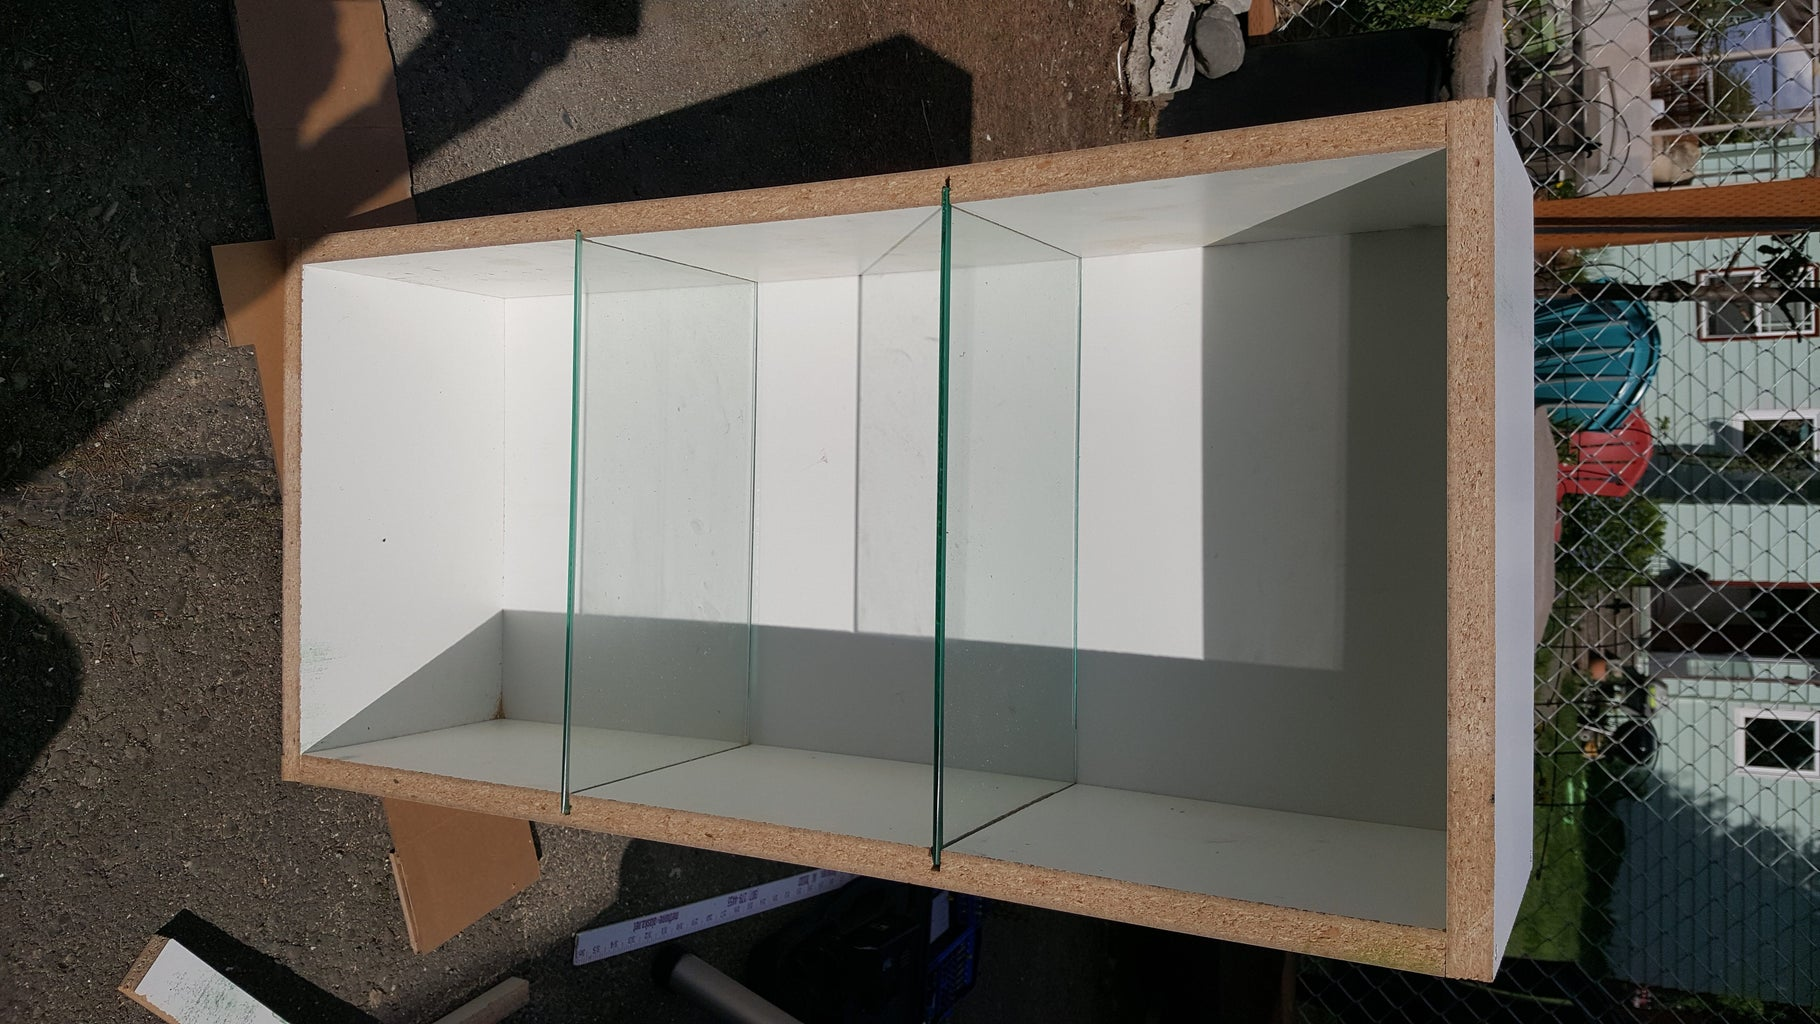 Assembling the Shelf